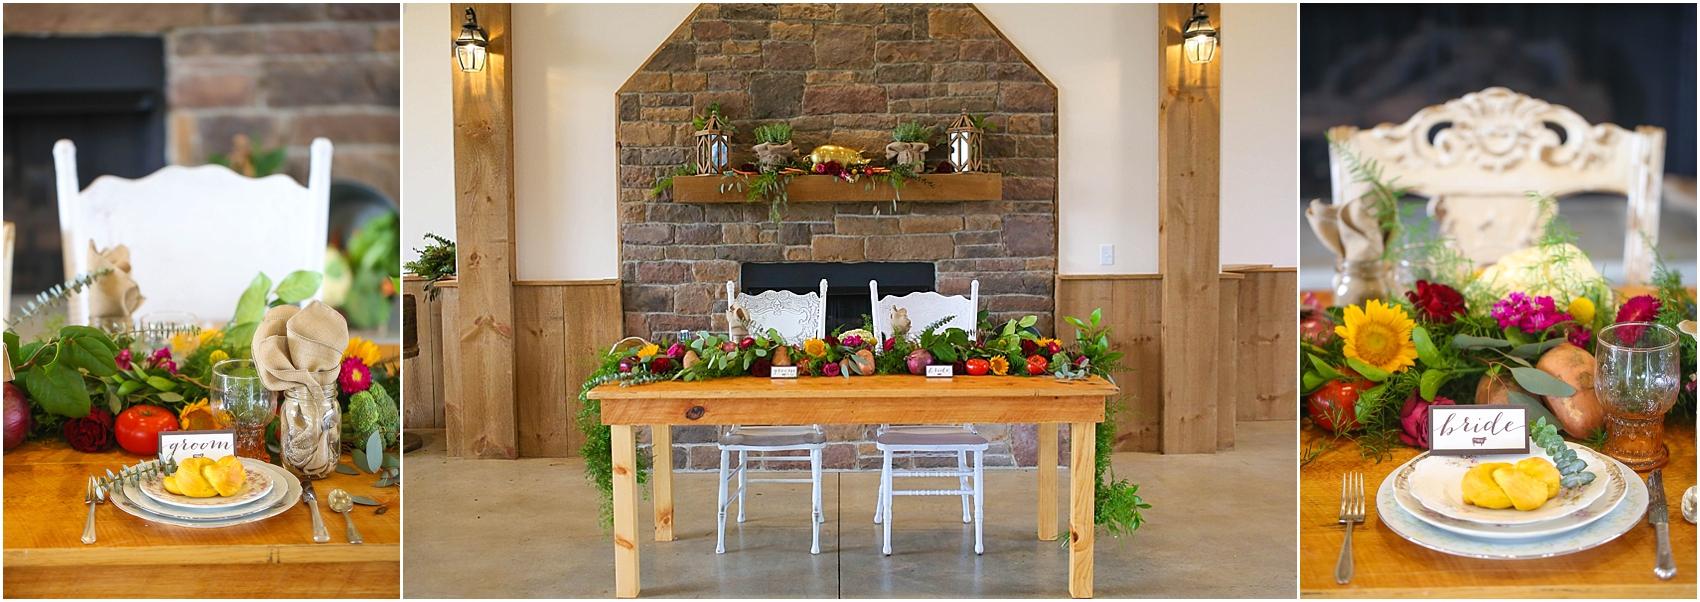 Central_VA_Barn_at_Edgewood_Farm_Farm_to_Table_Styled_Shoot_0013.jpg